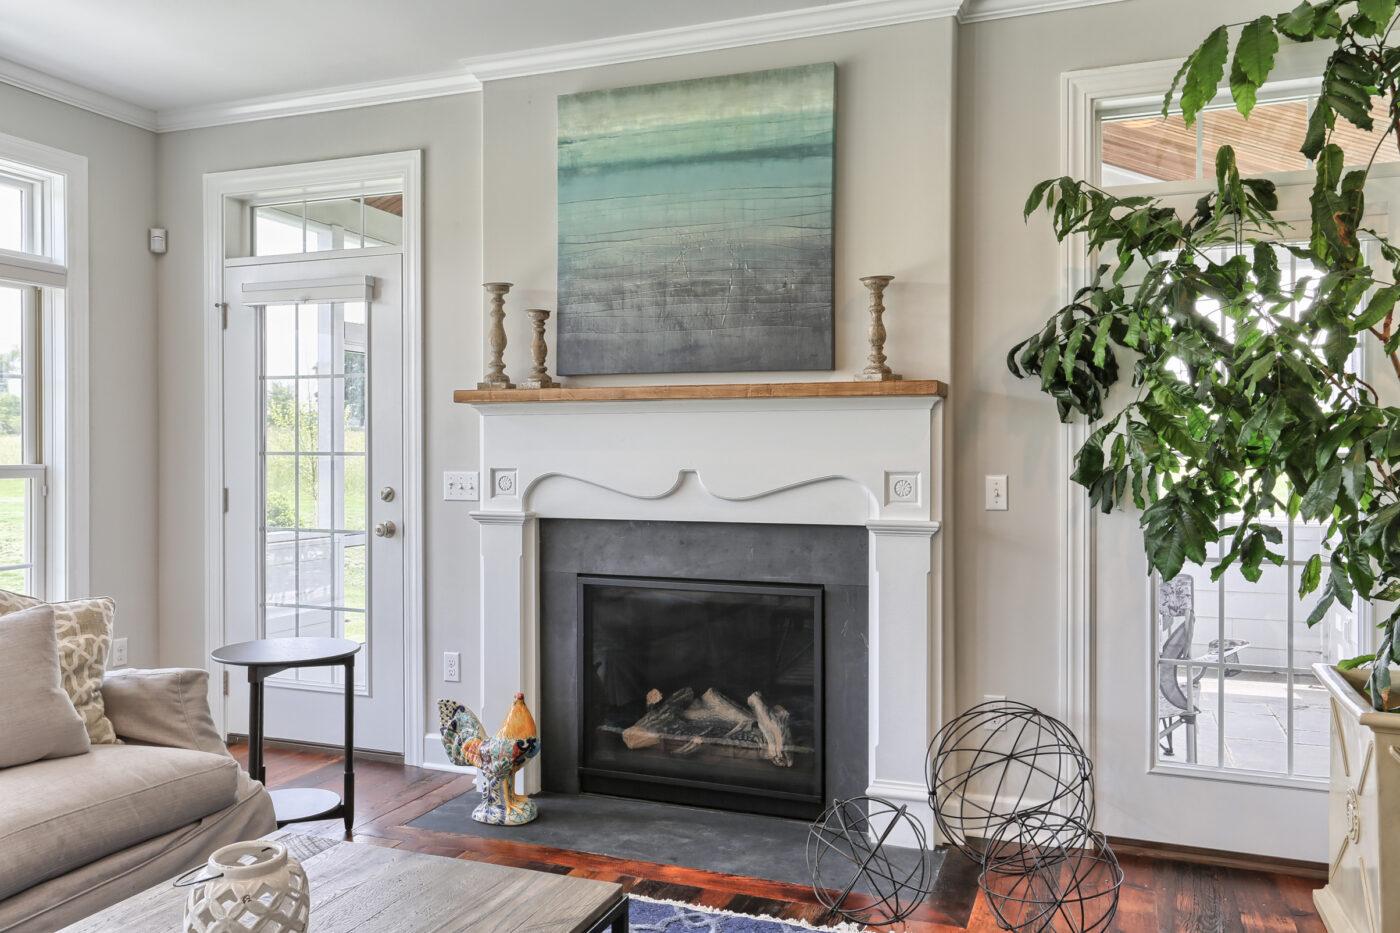 decorative-fireplace-surround-slate